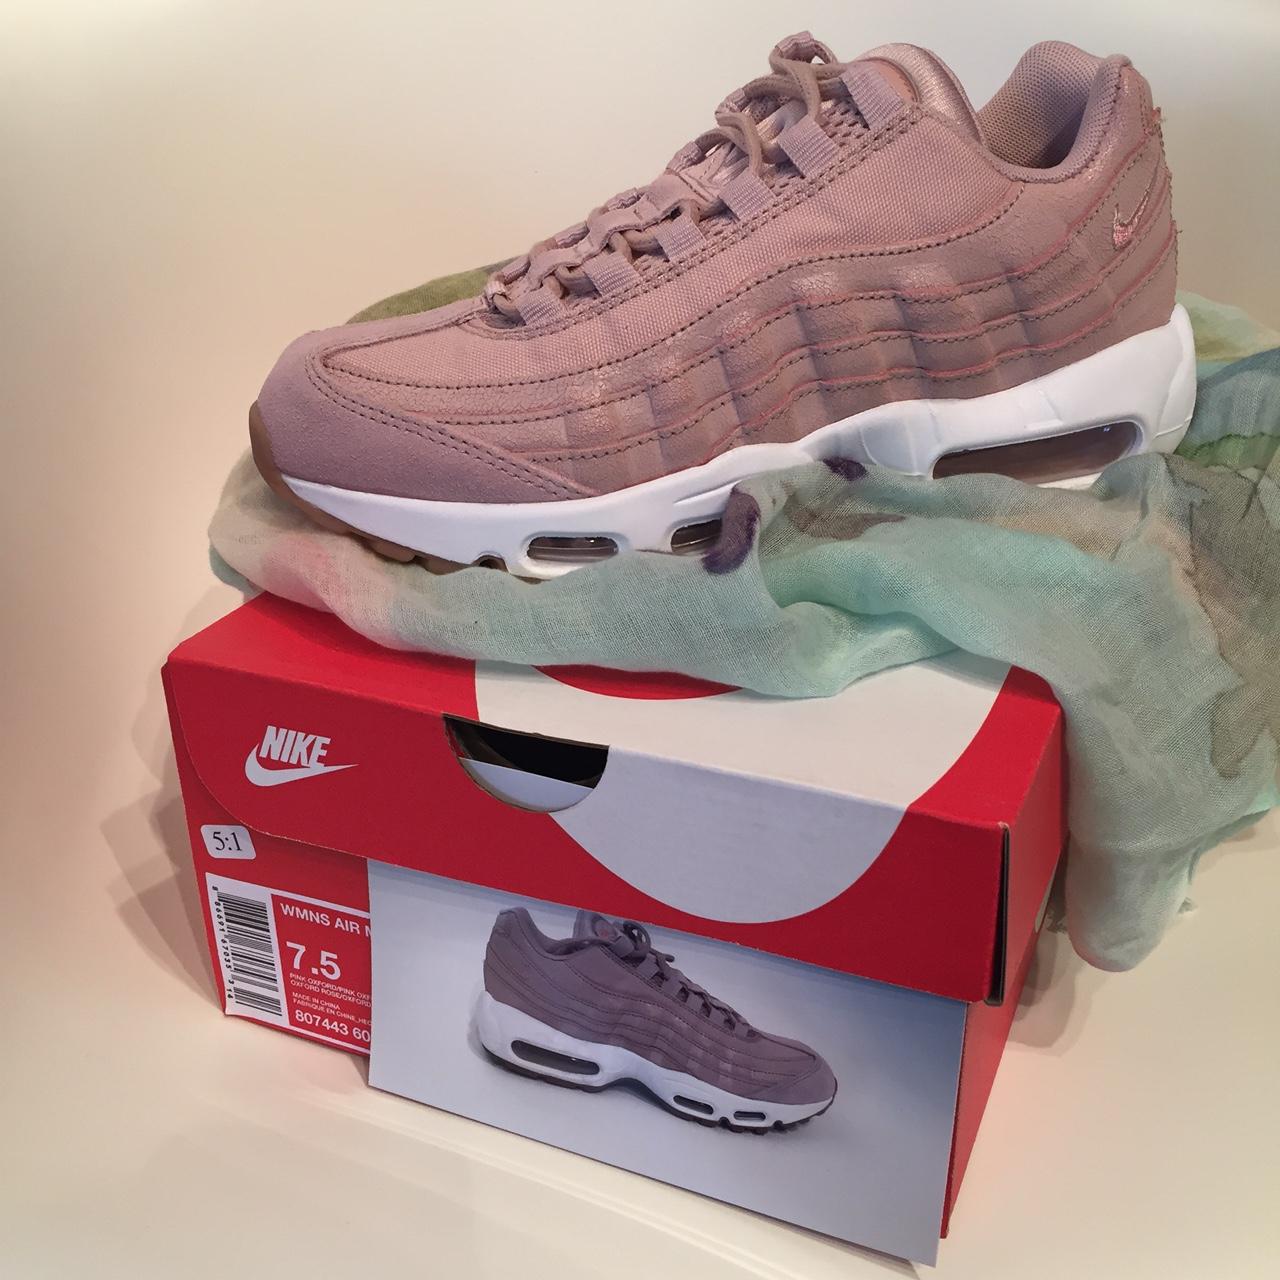 sneaker-box